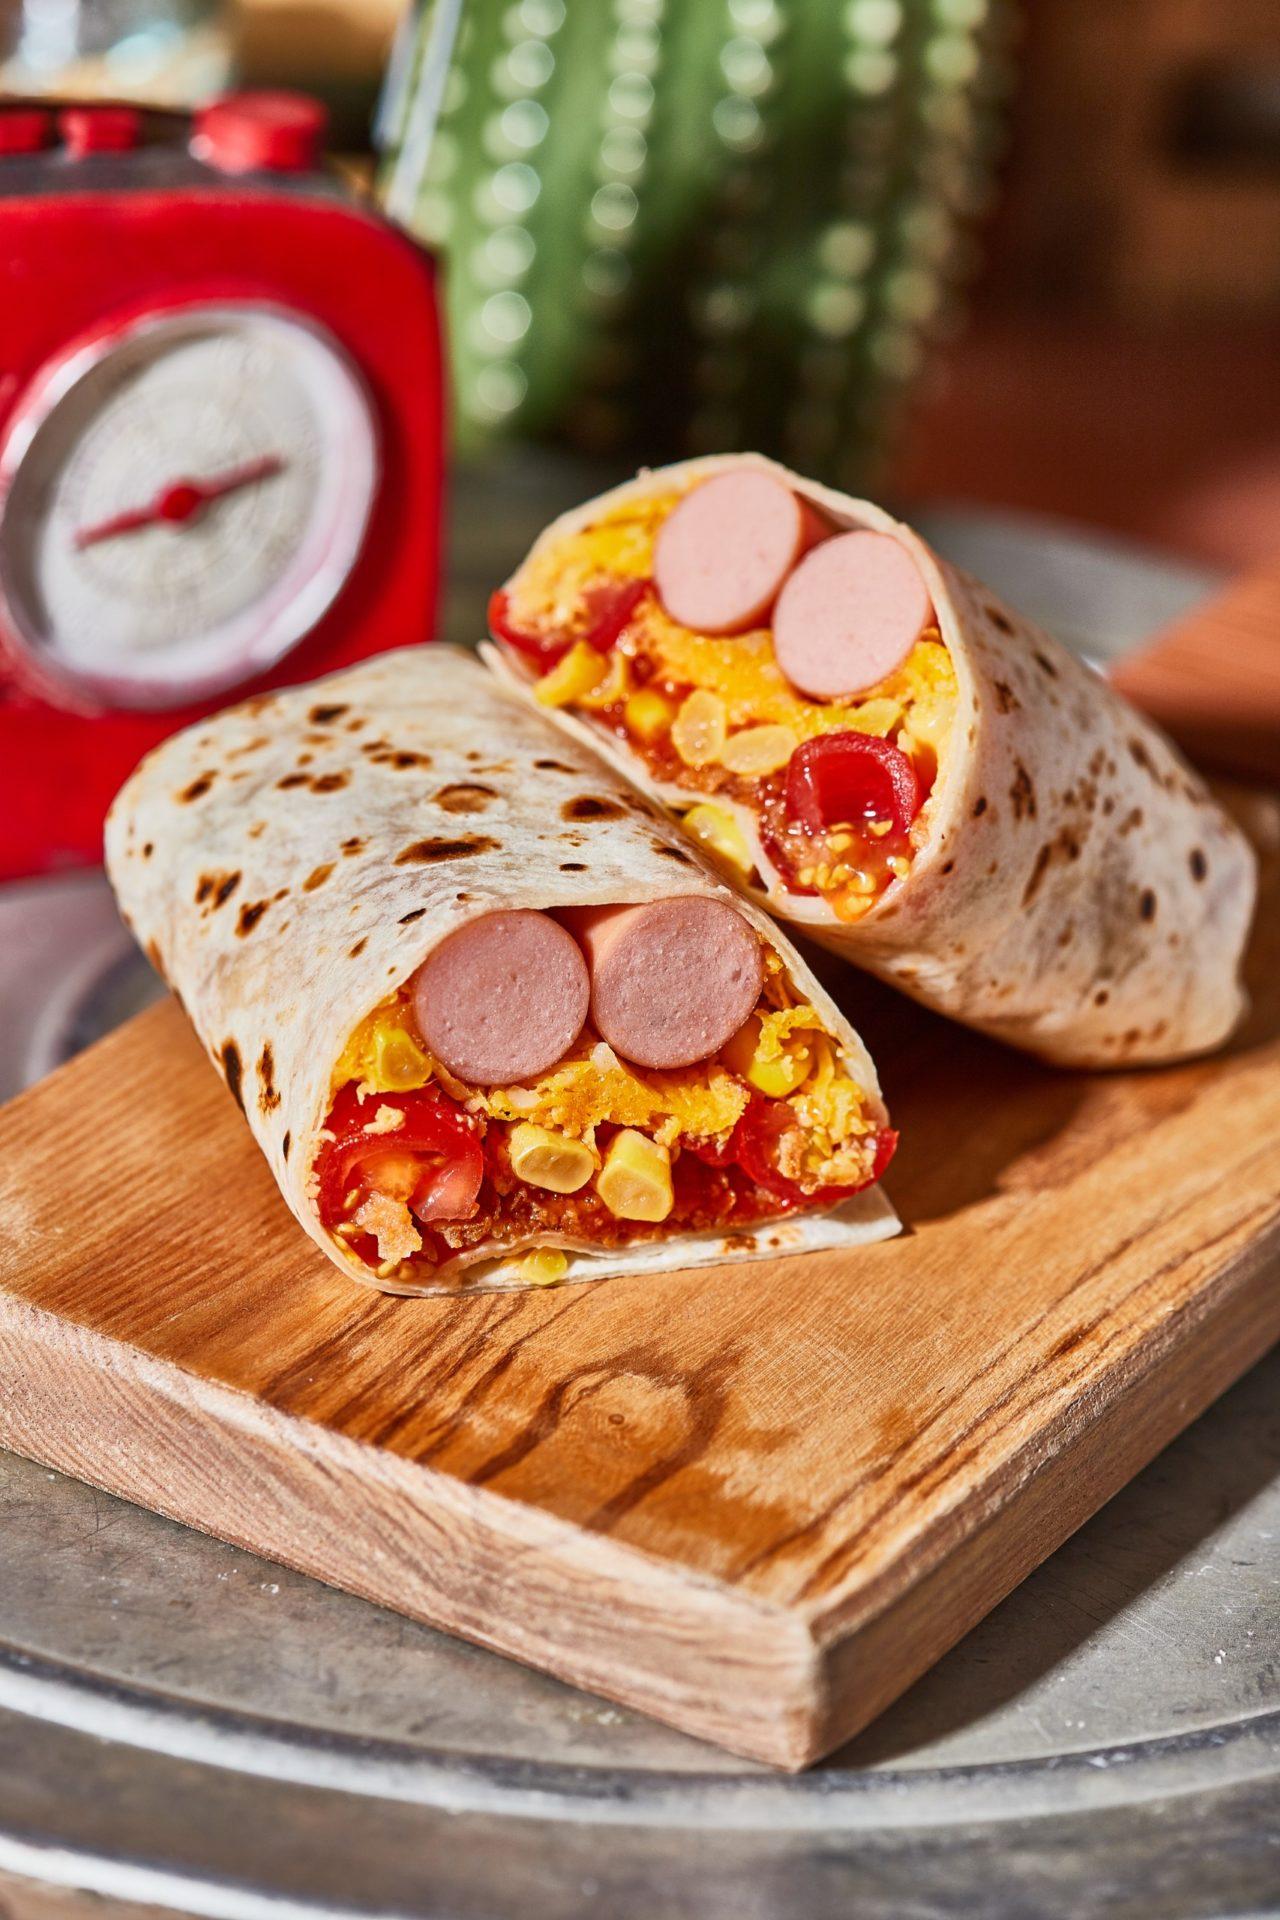 Mexikói hot dog